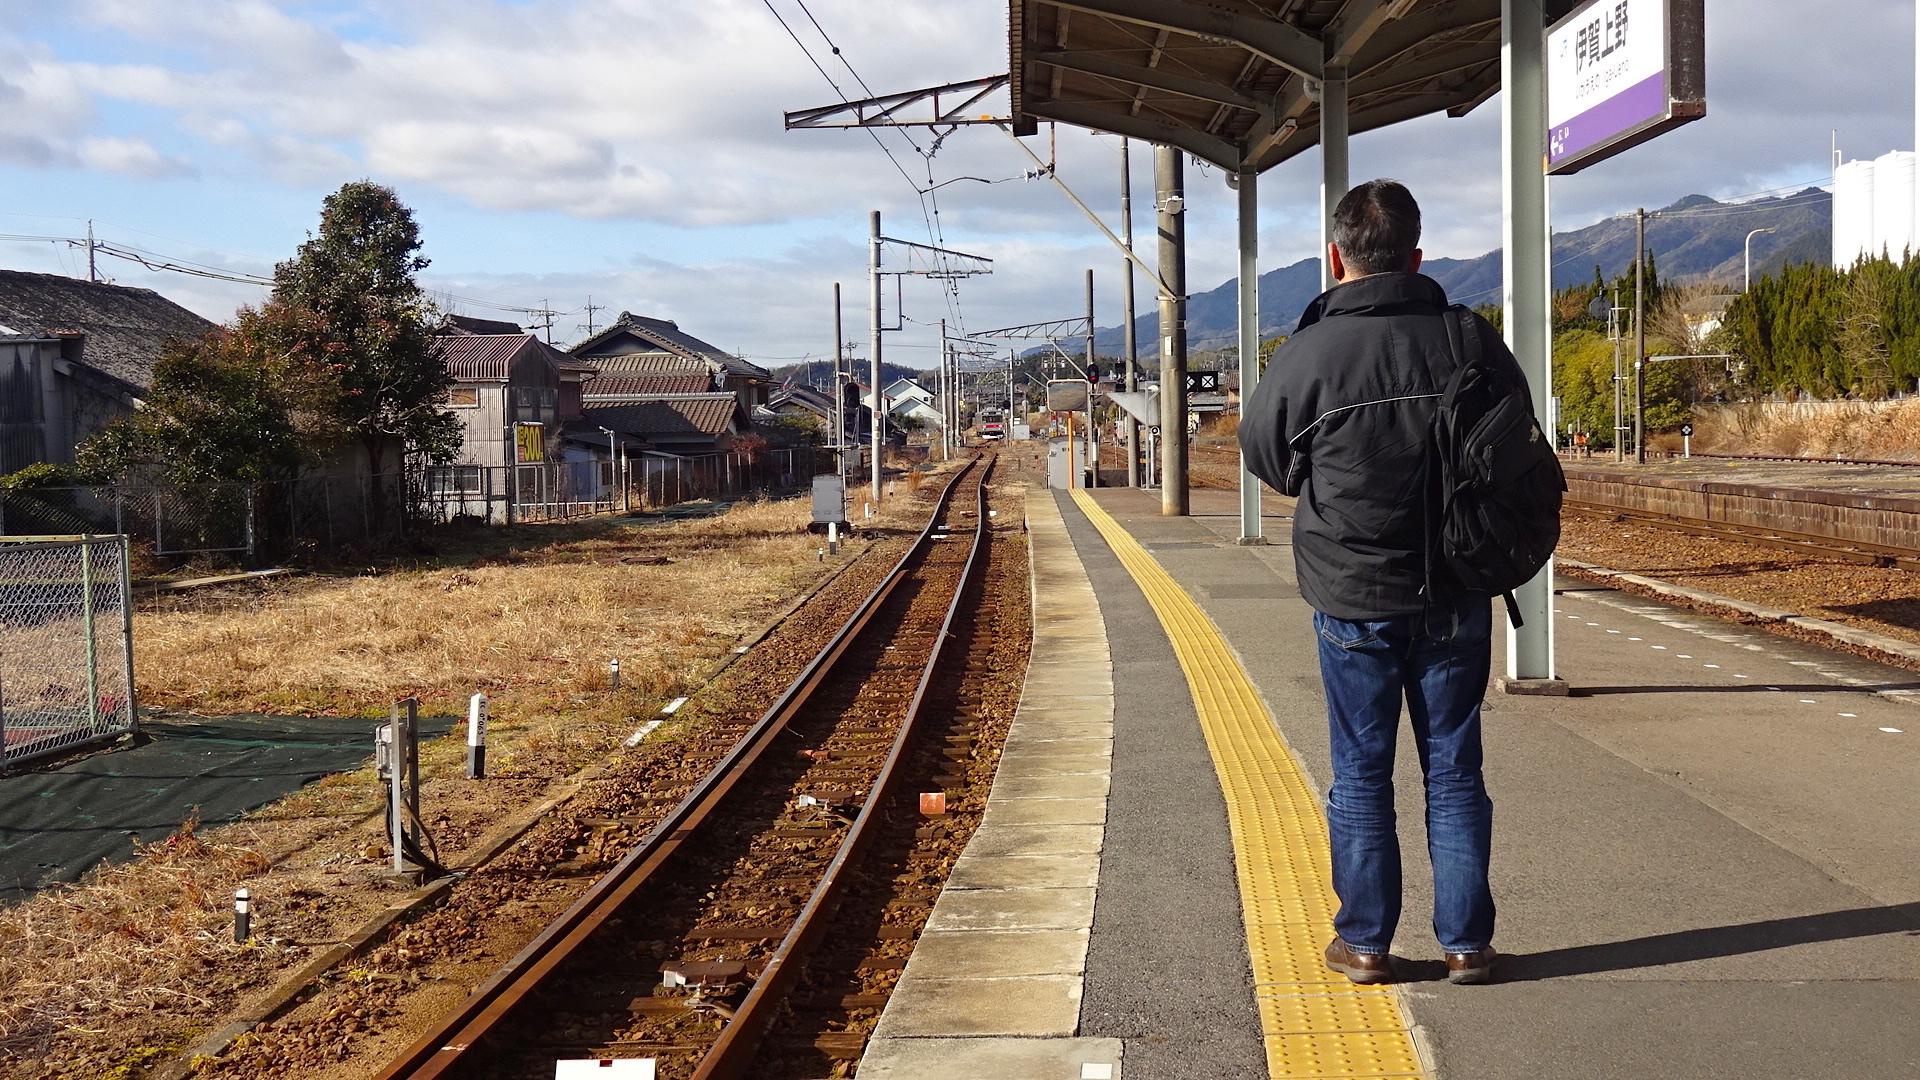 http://cdn-ak.f.st-hatena.com/images/fotolife/s/shioshiohida/20171228/20171228102814_original.jpg?1514560632